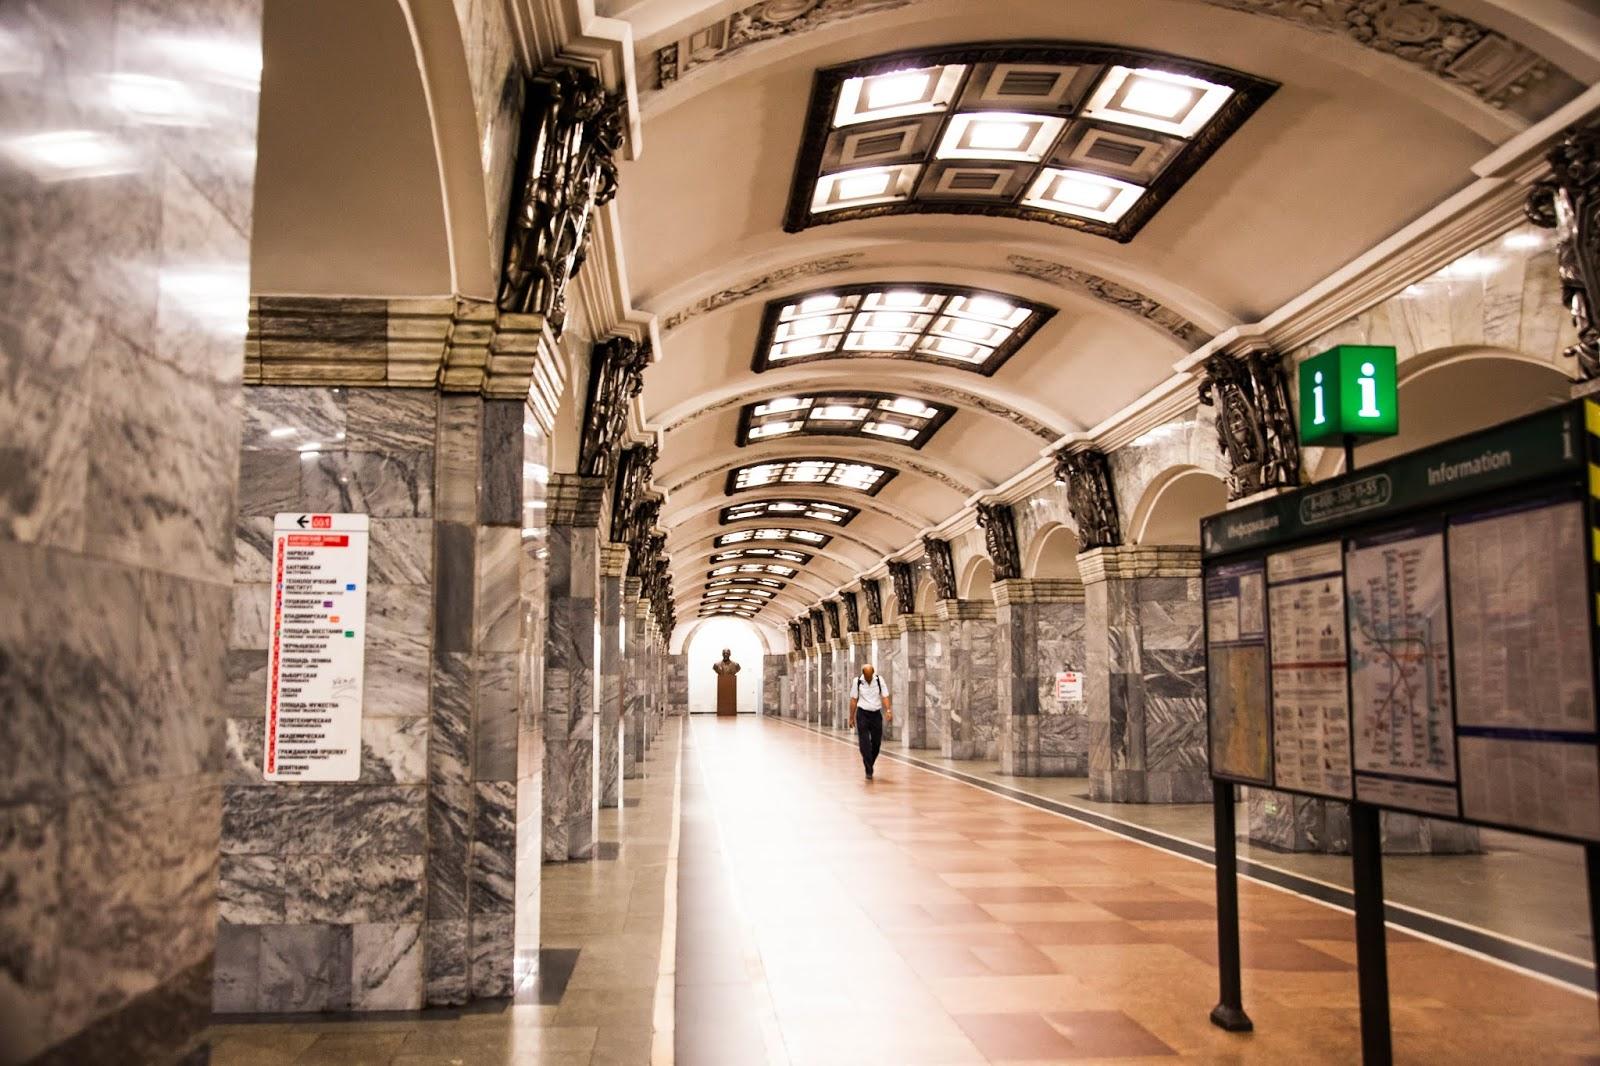 kirovski zavod, metro, st. petersburg